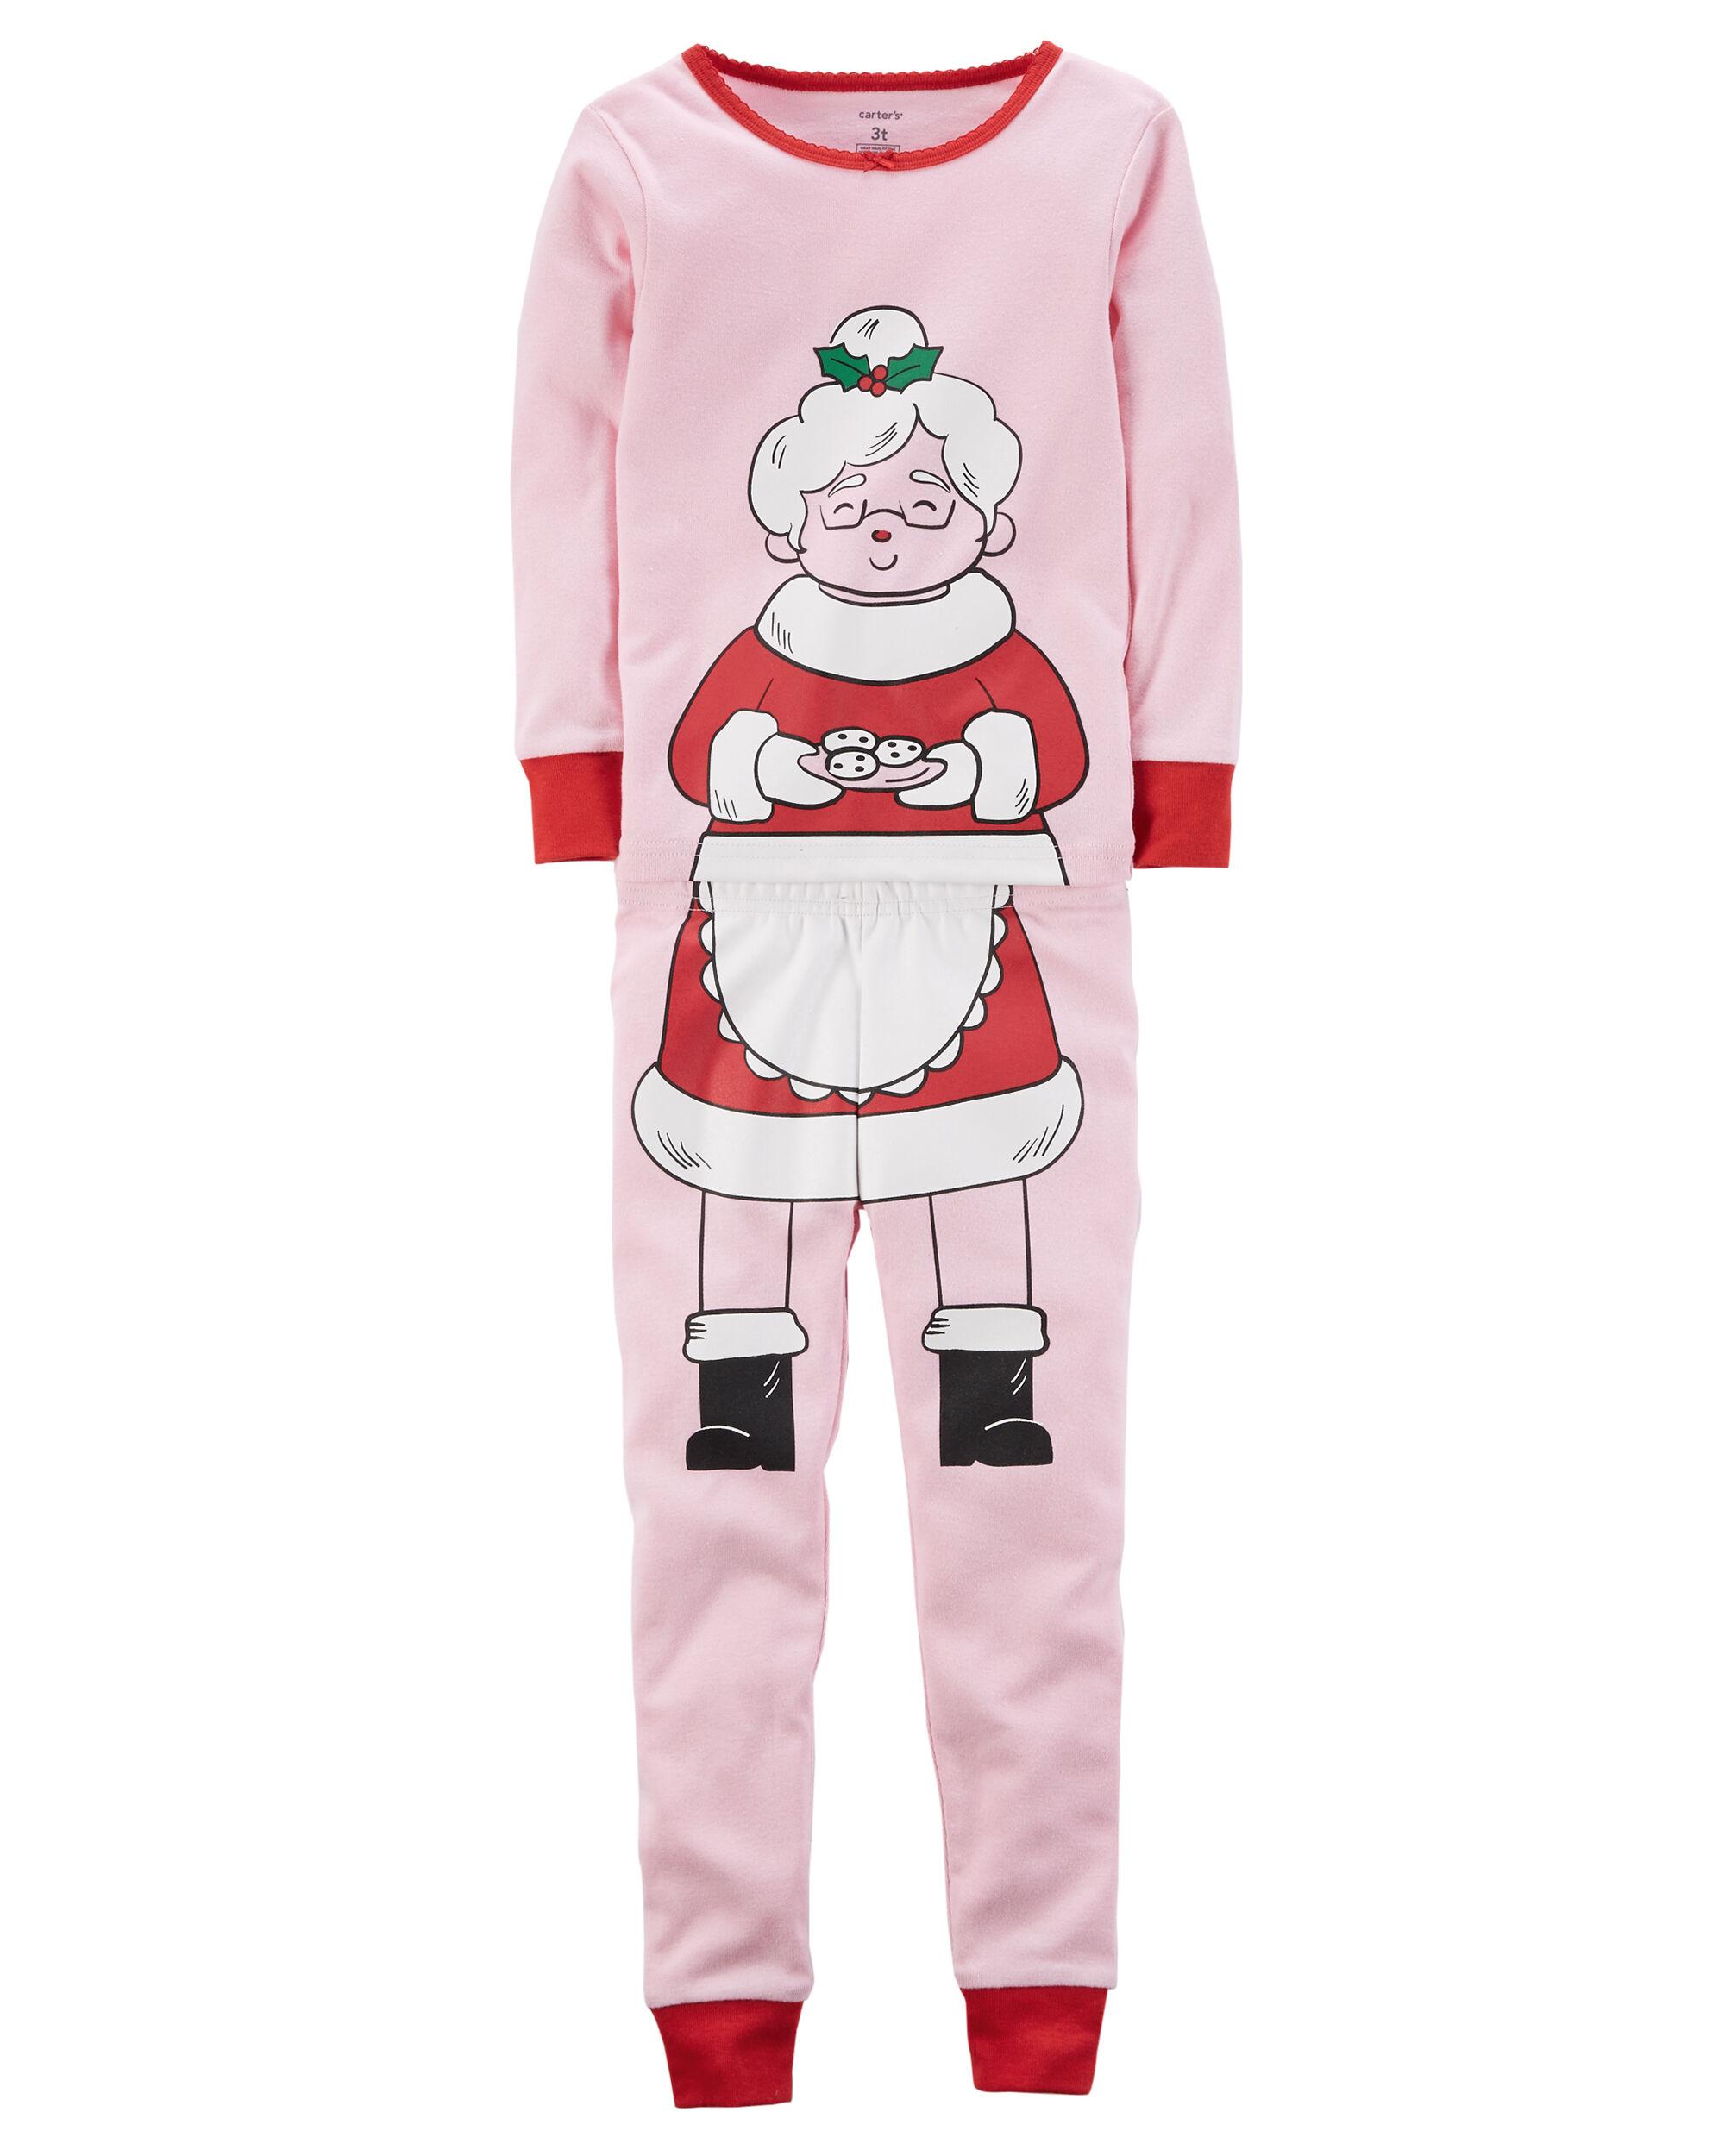 ... Santa Cotton Tight Fit Pajama  best authentic 8ef6a f0ad7 ... 2-Piece  Christmas Snug Fit Cotton PJs ... 4411b85a8